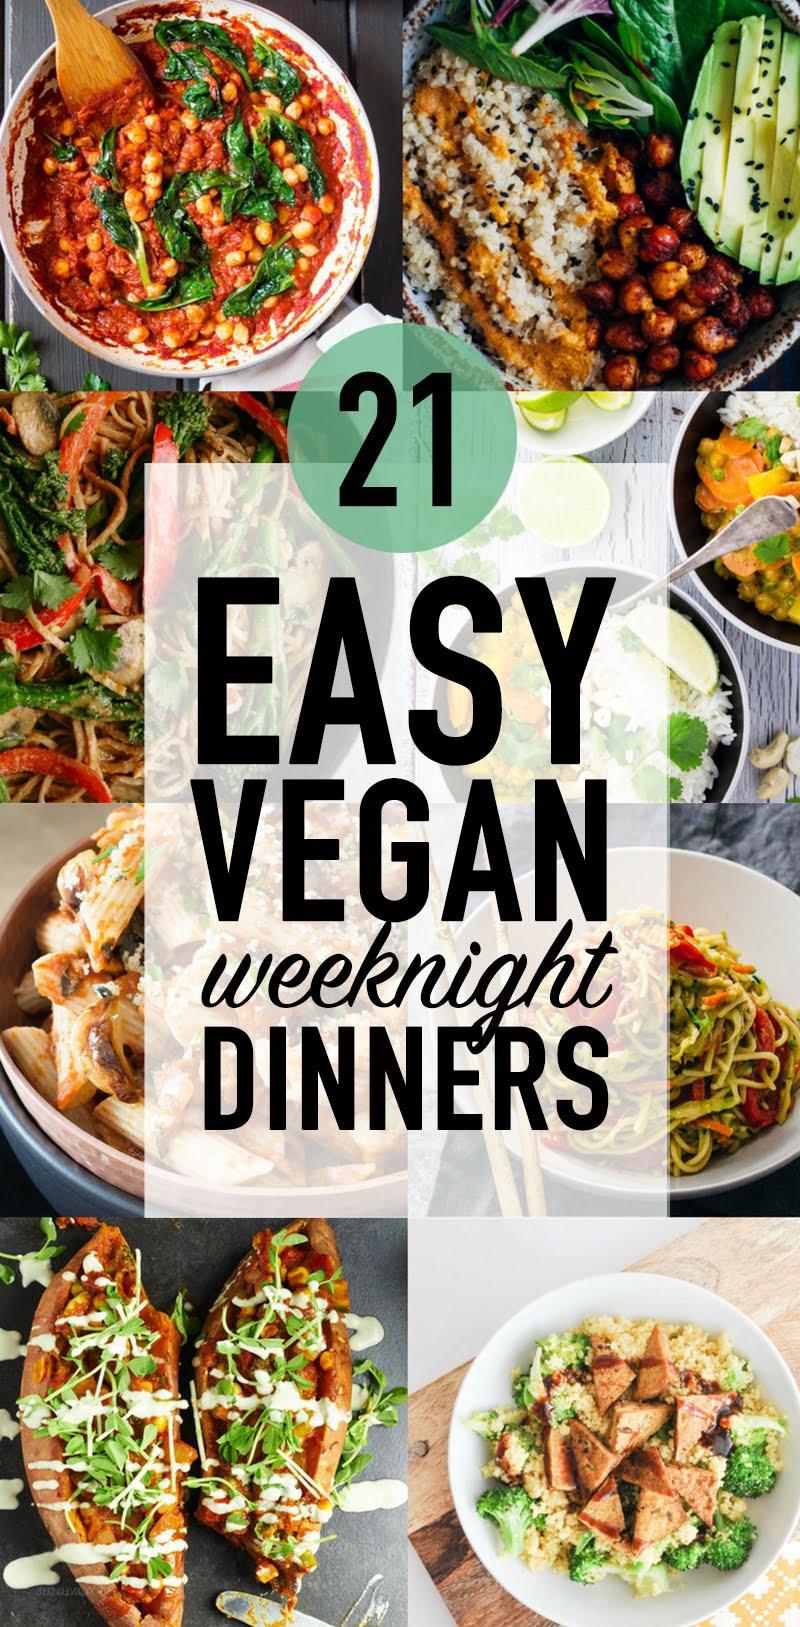 21 Easy, Heart-Healthy Dinner Recipes 21 Easy, Heart-Healthy Dinner Recipes new pics